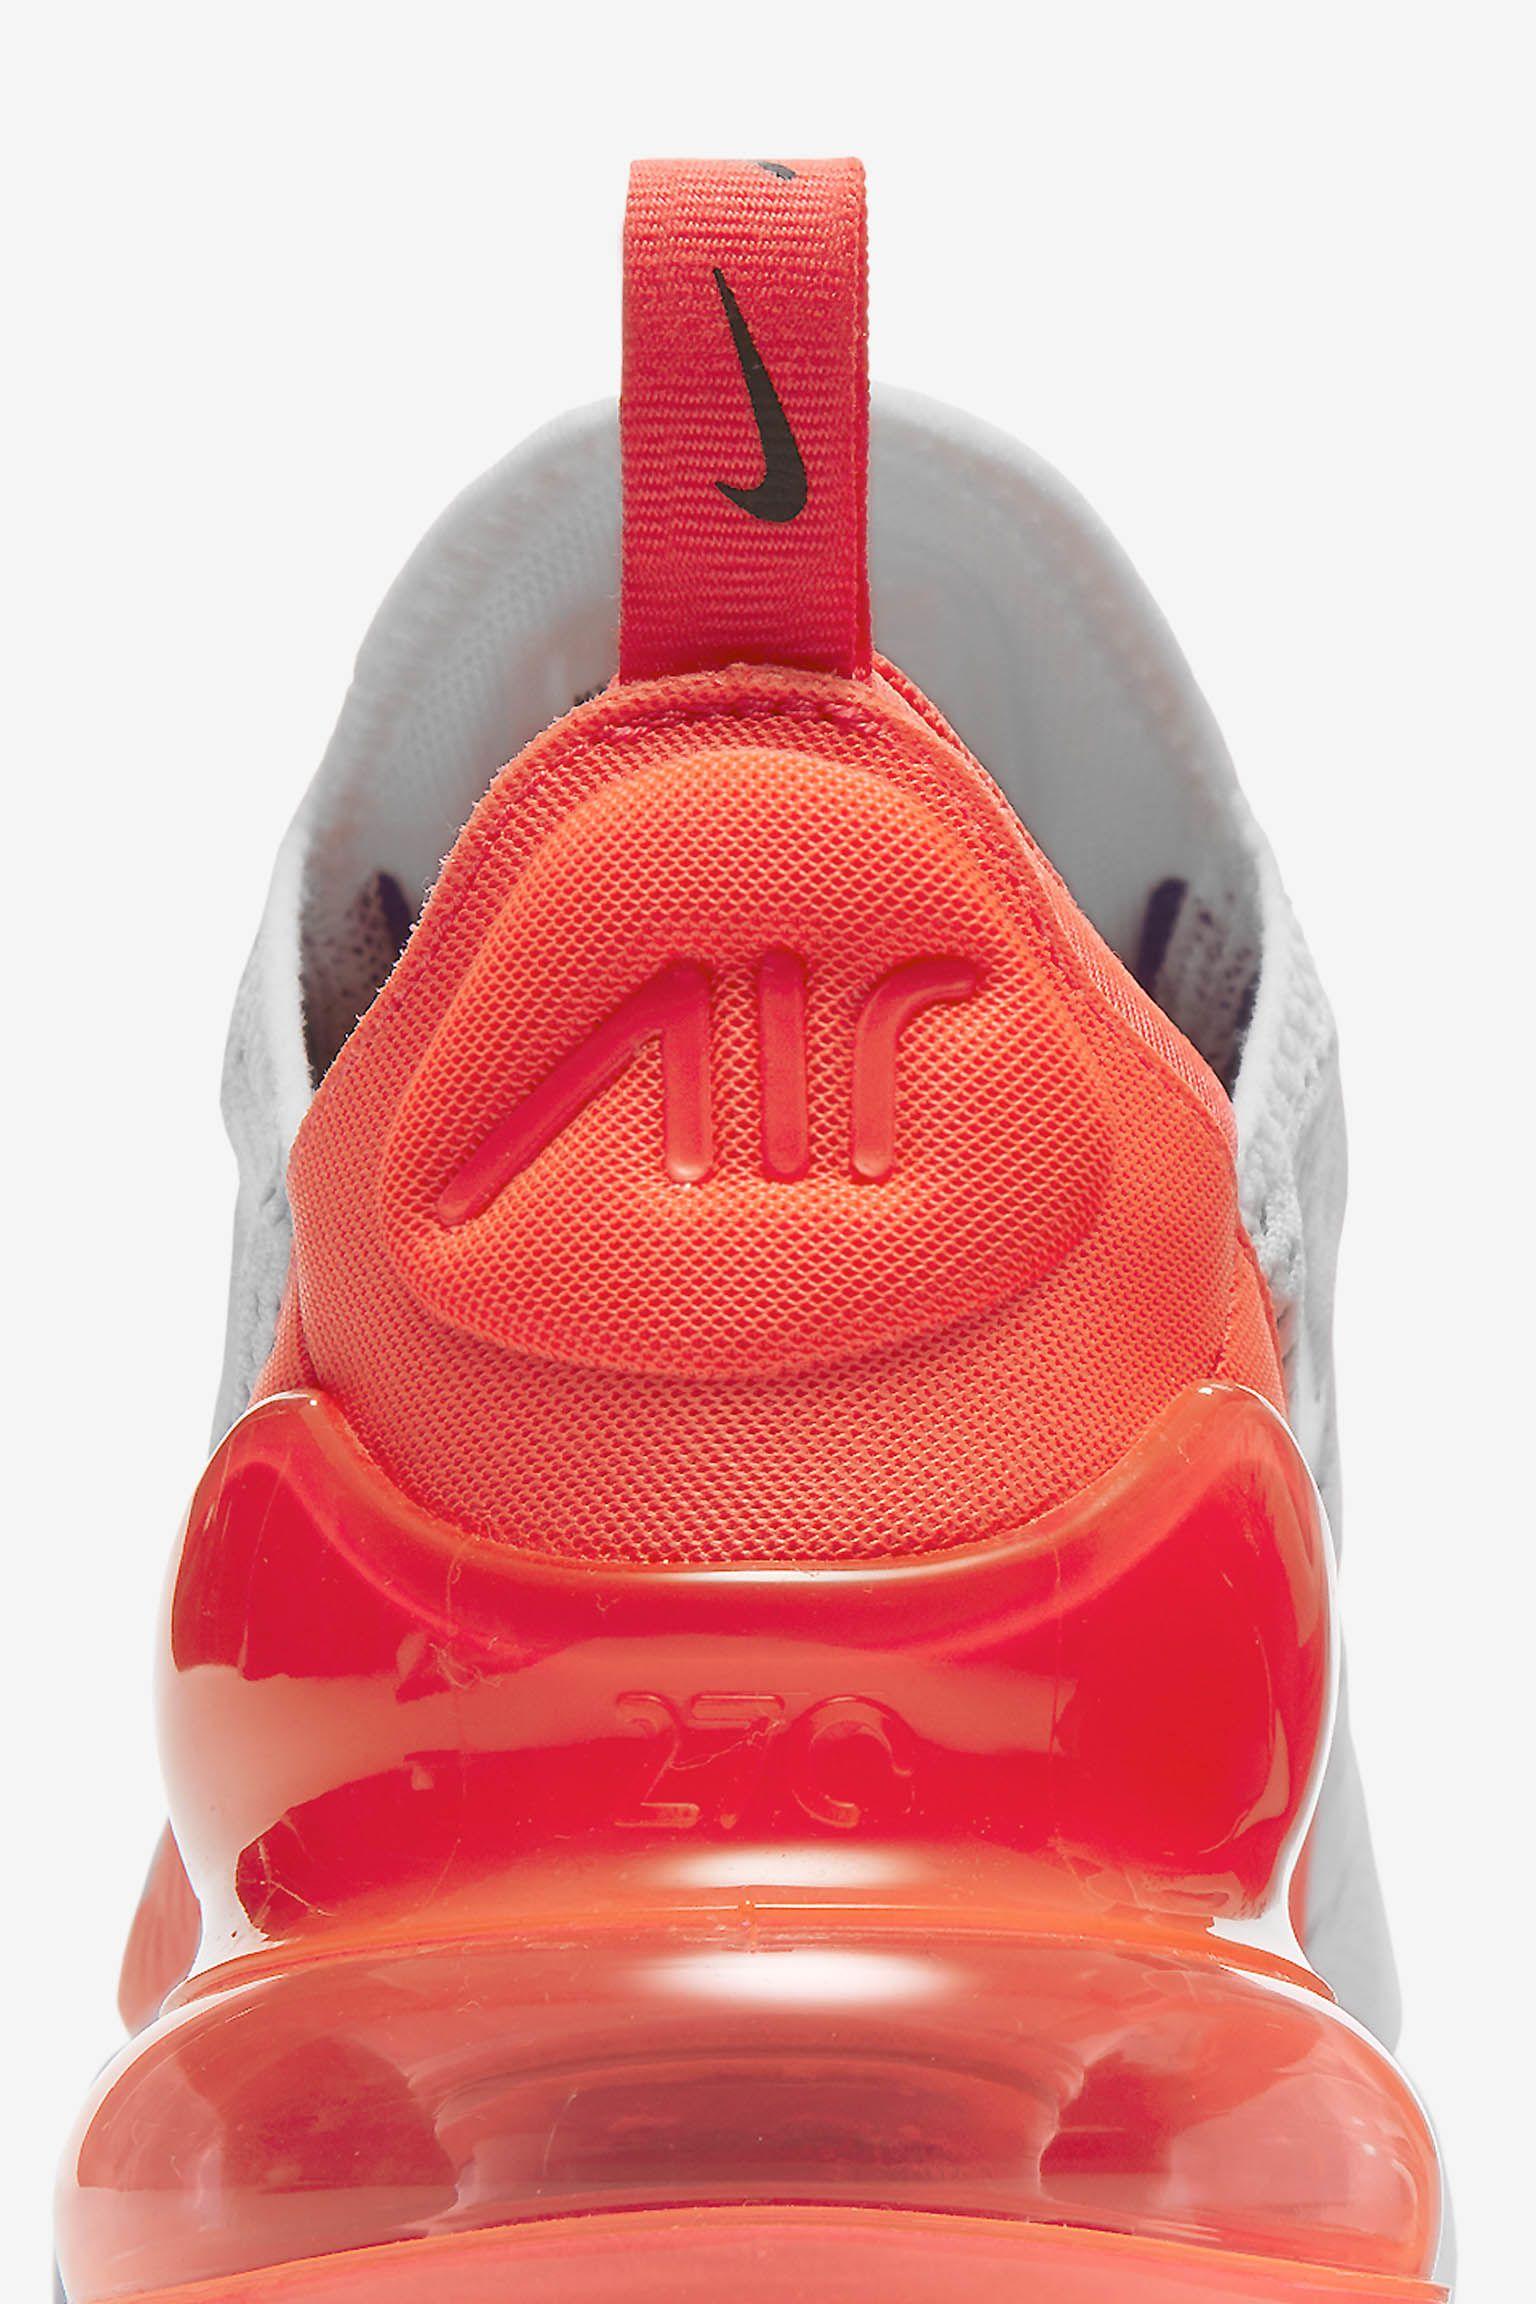 Nike Womens Air Max 270 'Ultramarine & Solar Red' Release Date